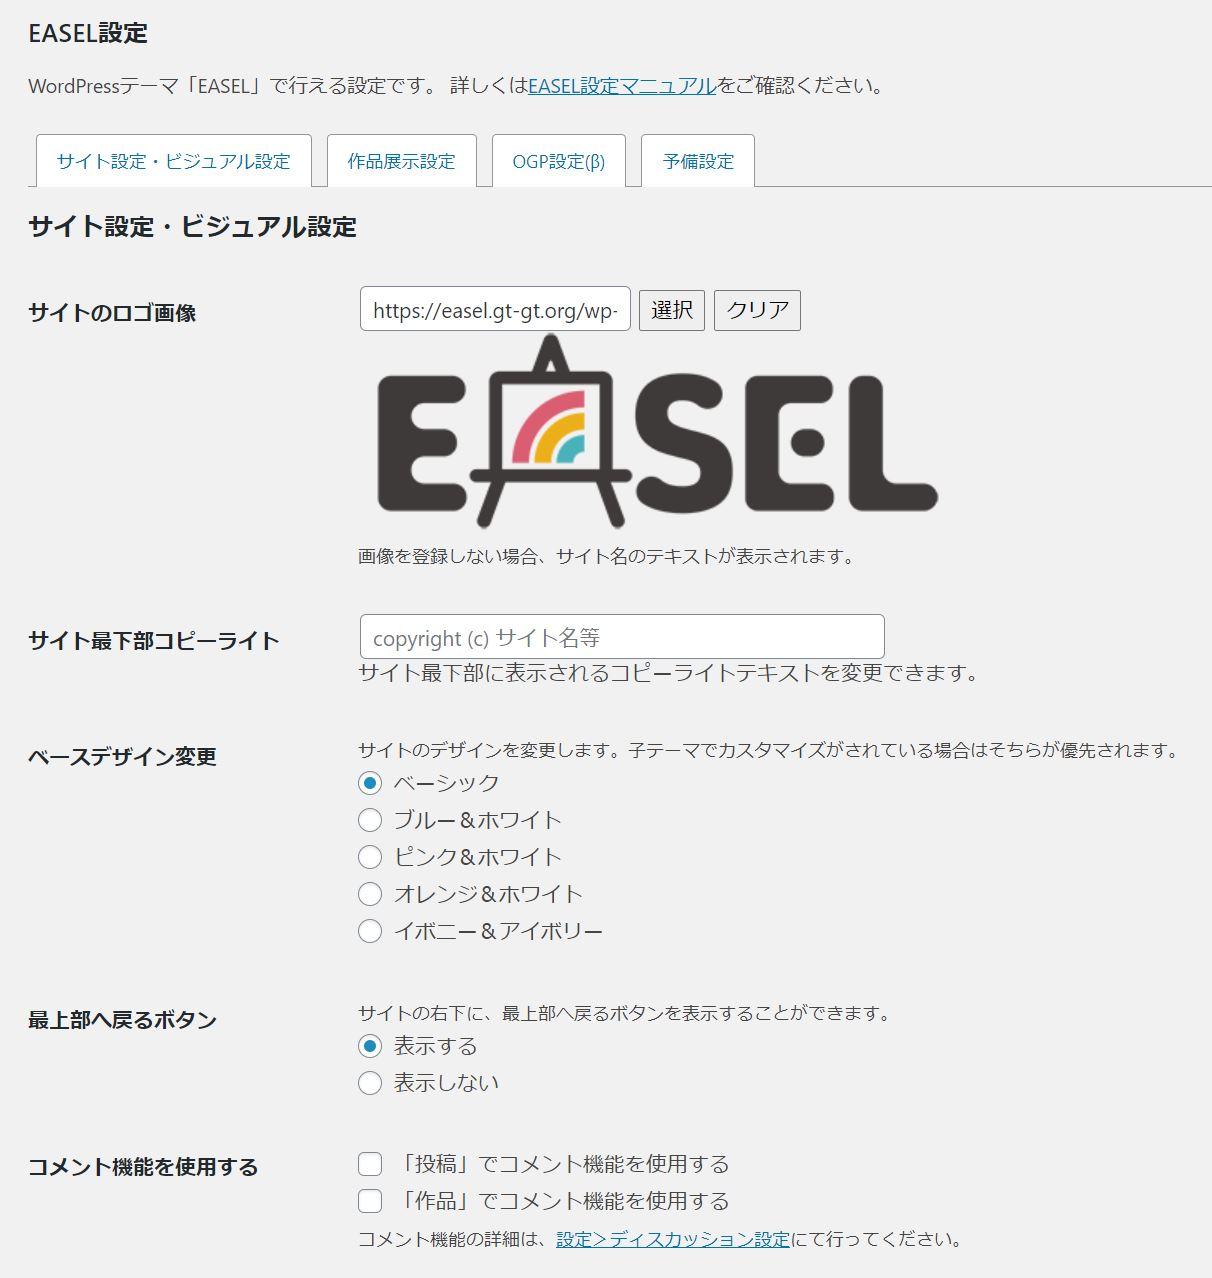 WordPressテーマ「EASEL」の設定画面